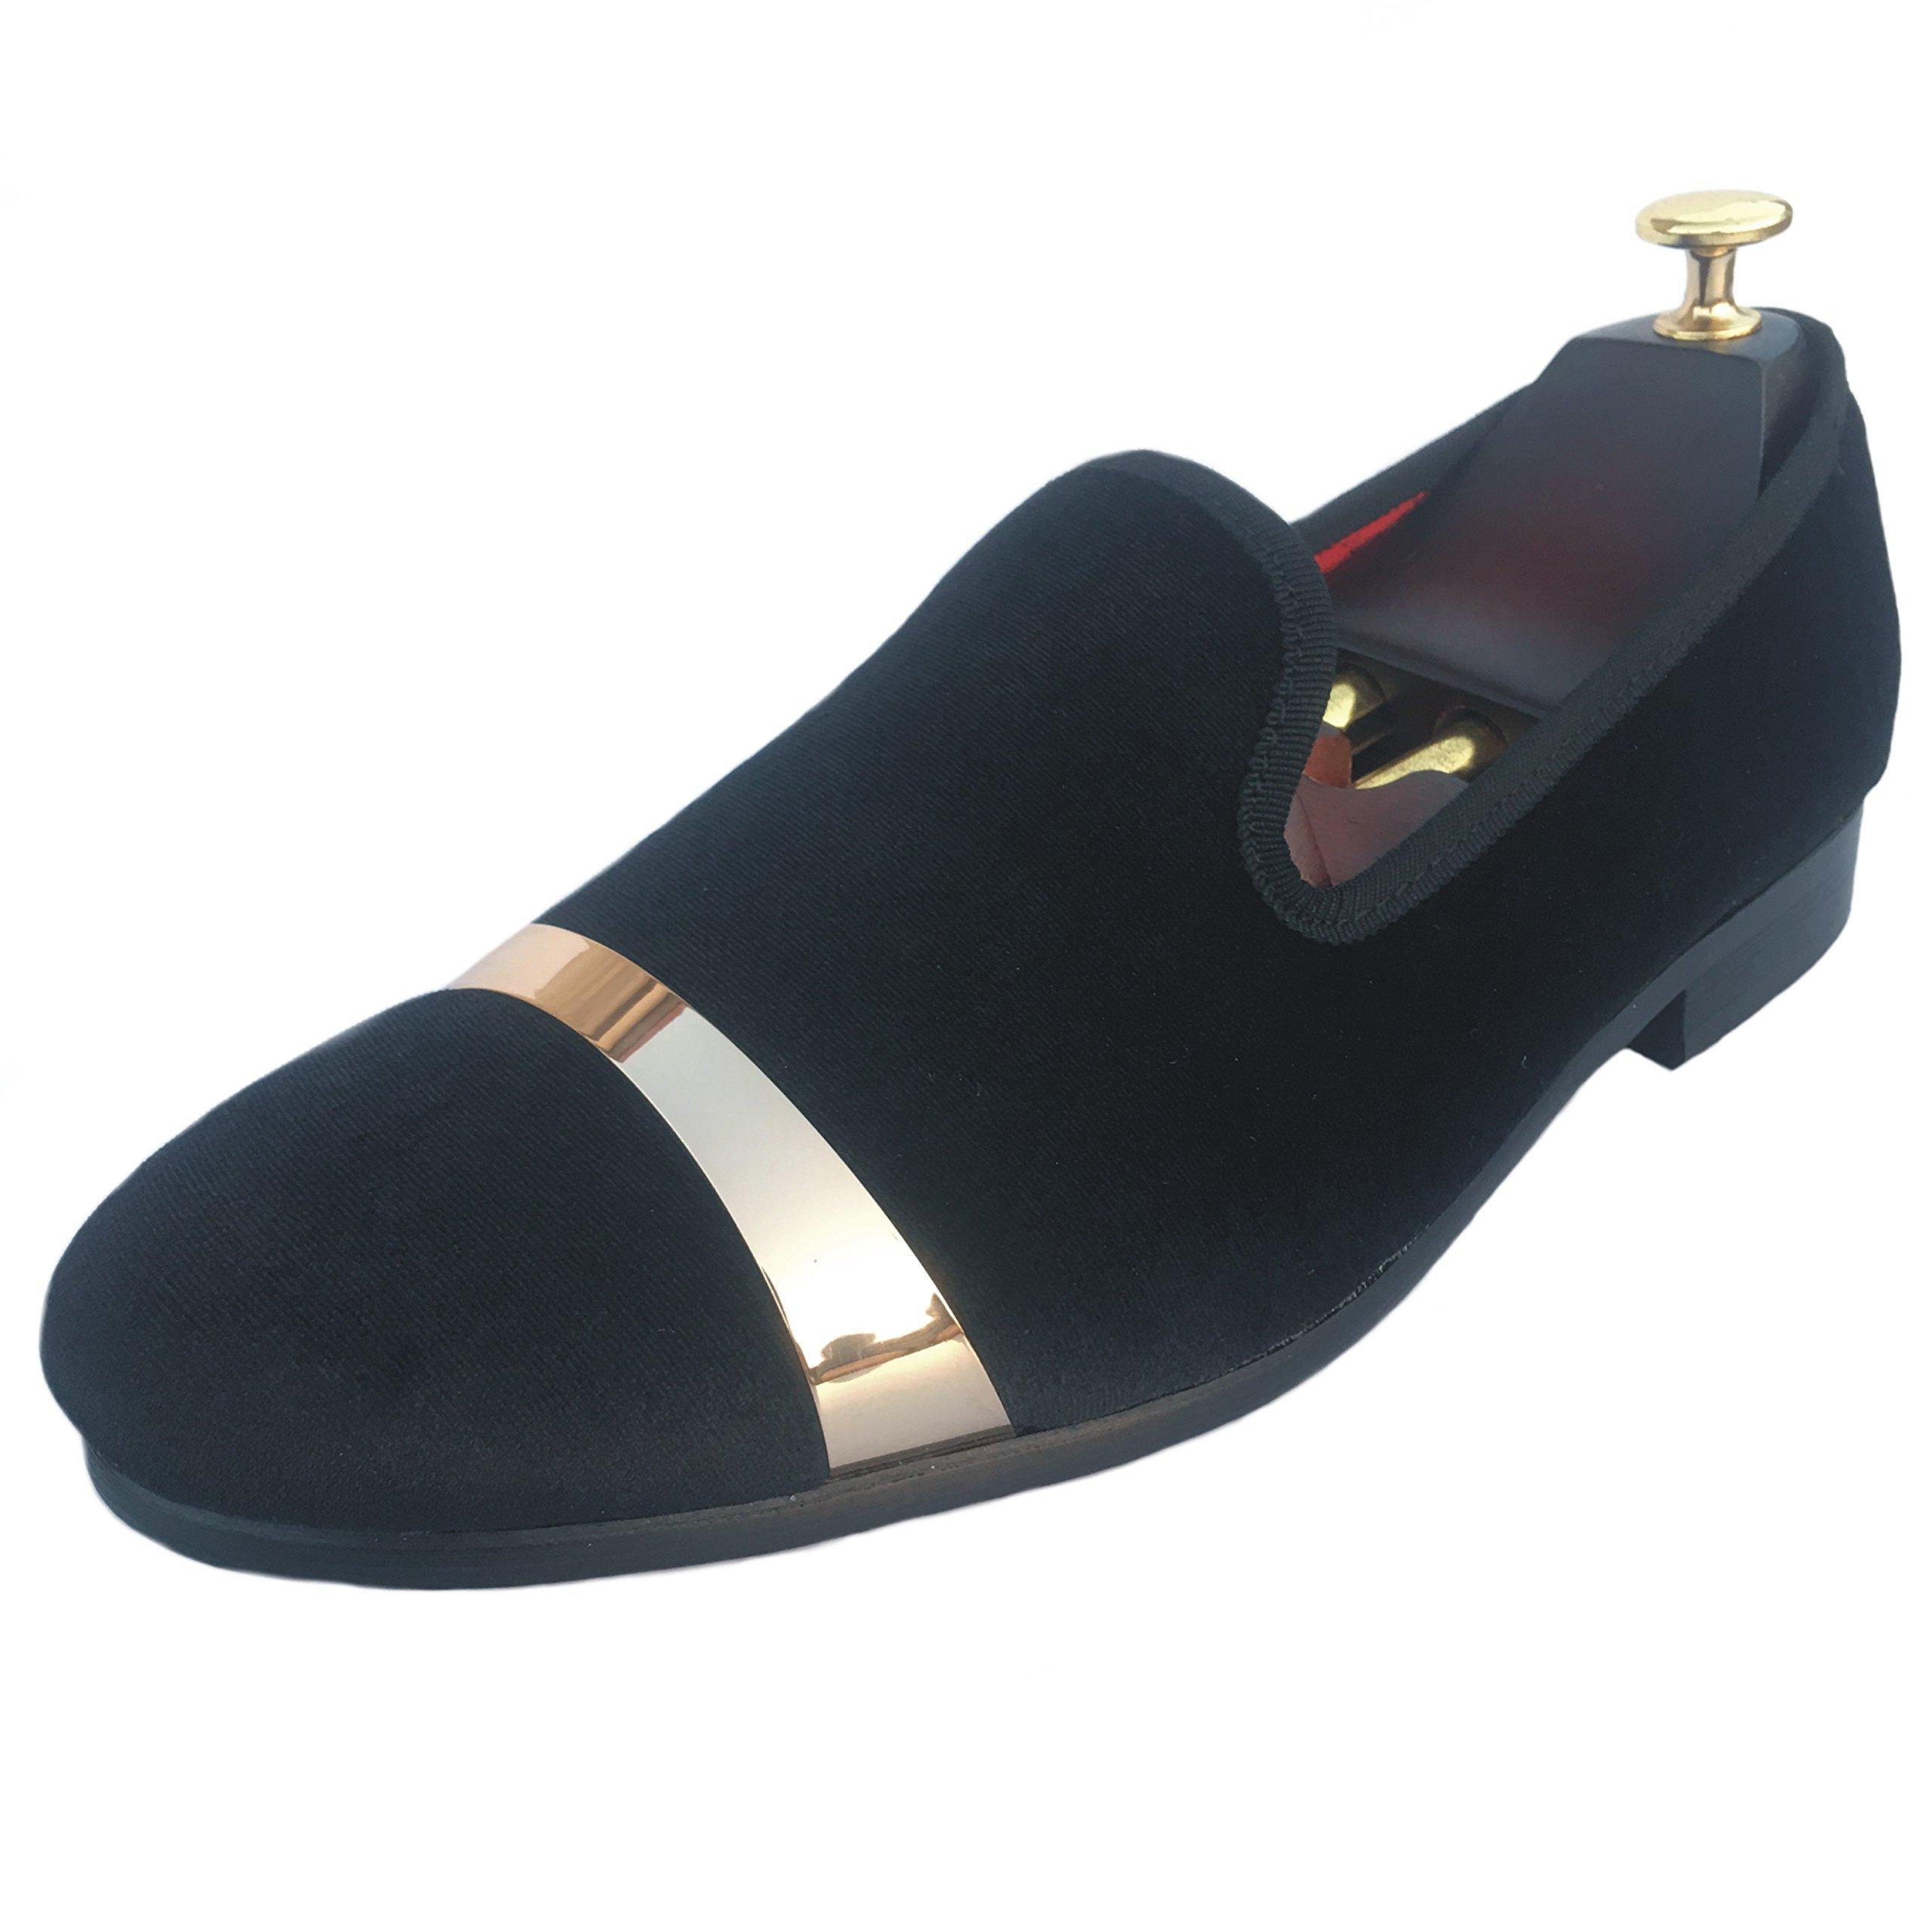 Justar Men's Velvet Loafers Dress Shoes Slip-on Wedding Slippers Flats Gold Buckle (12 D(M) US, Black)